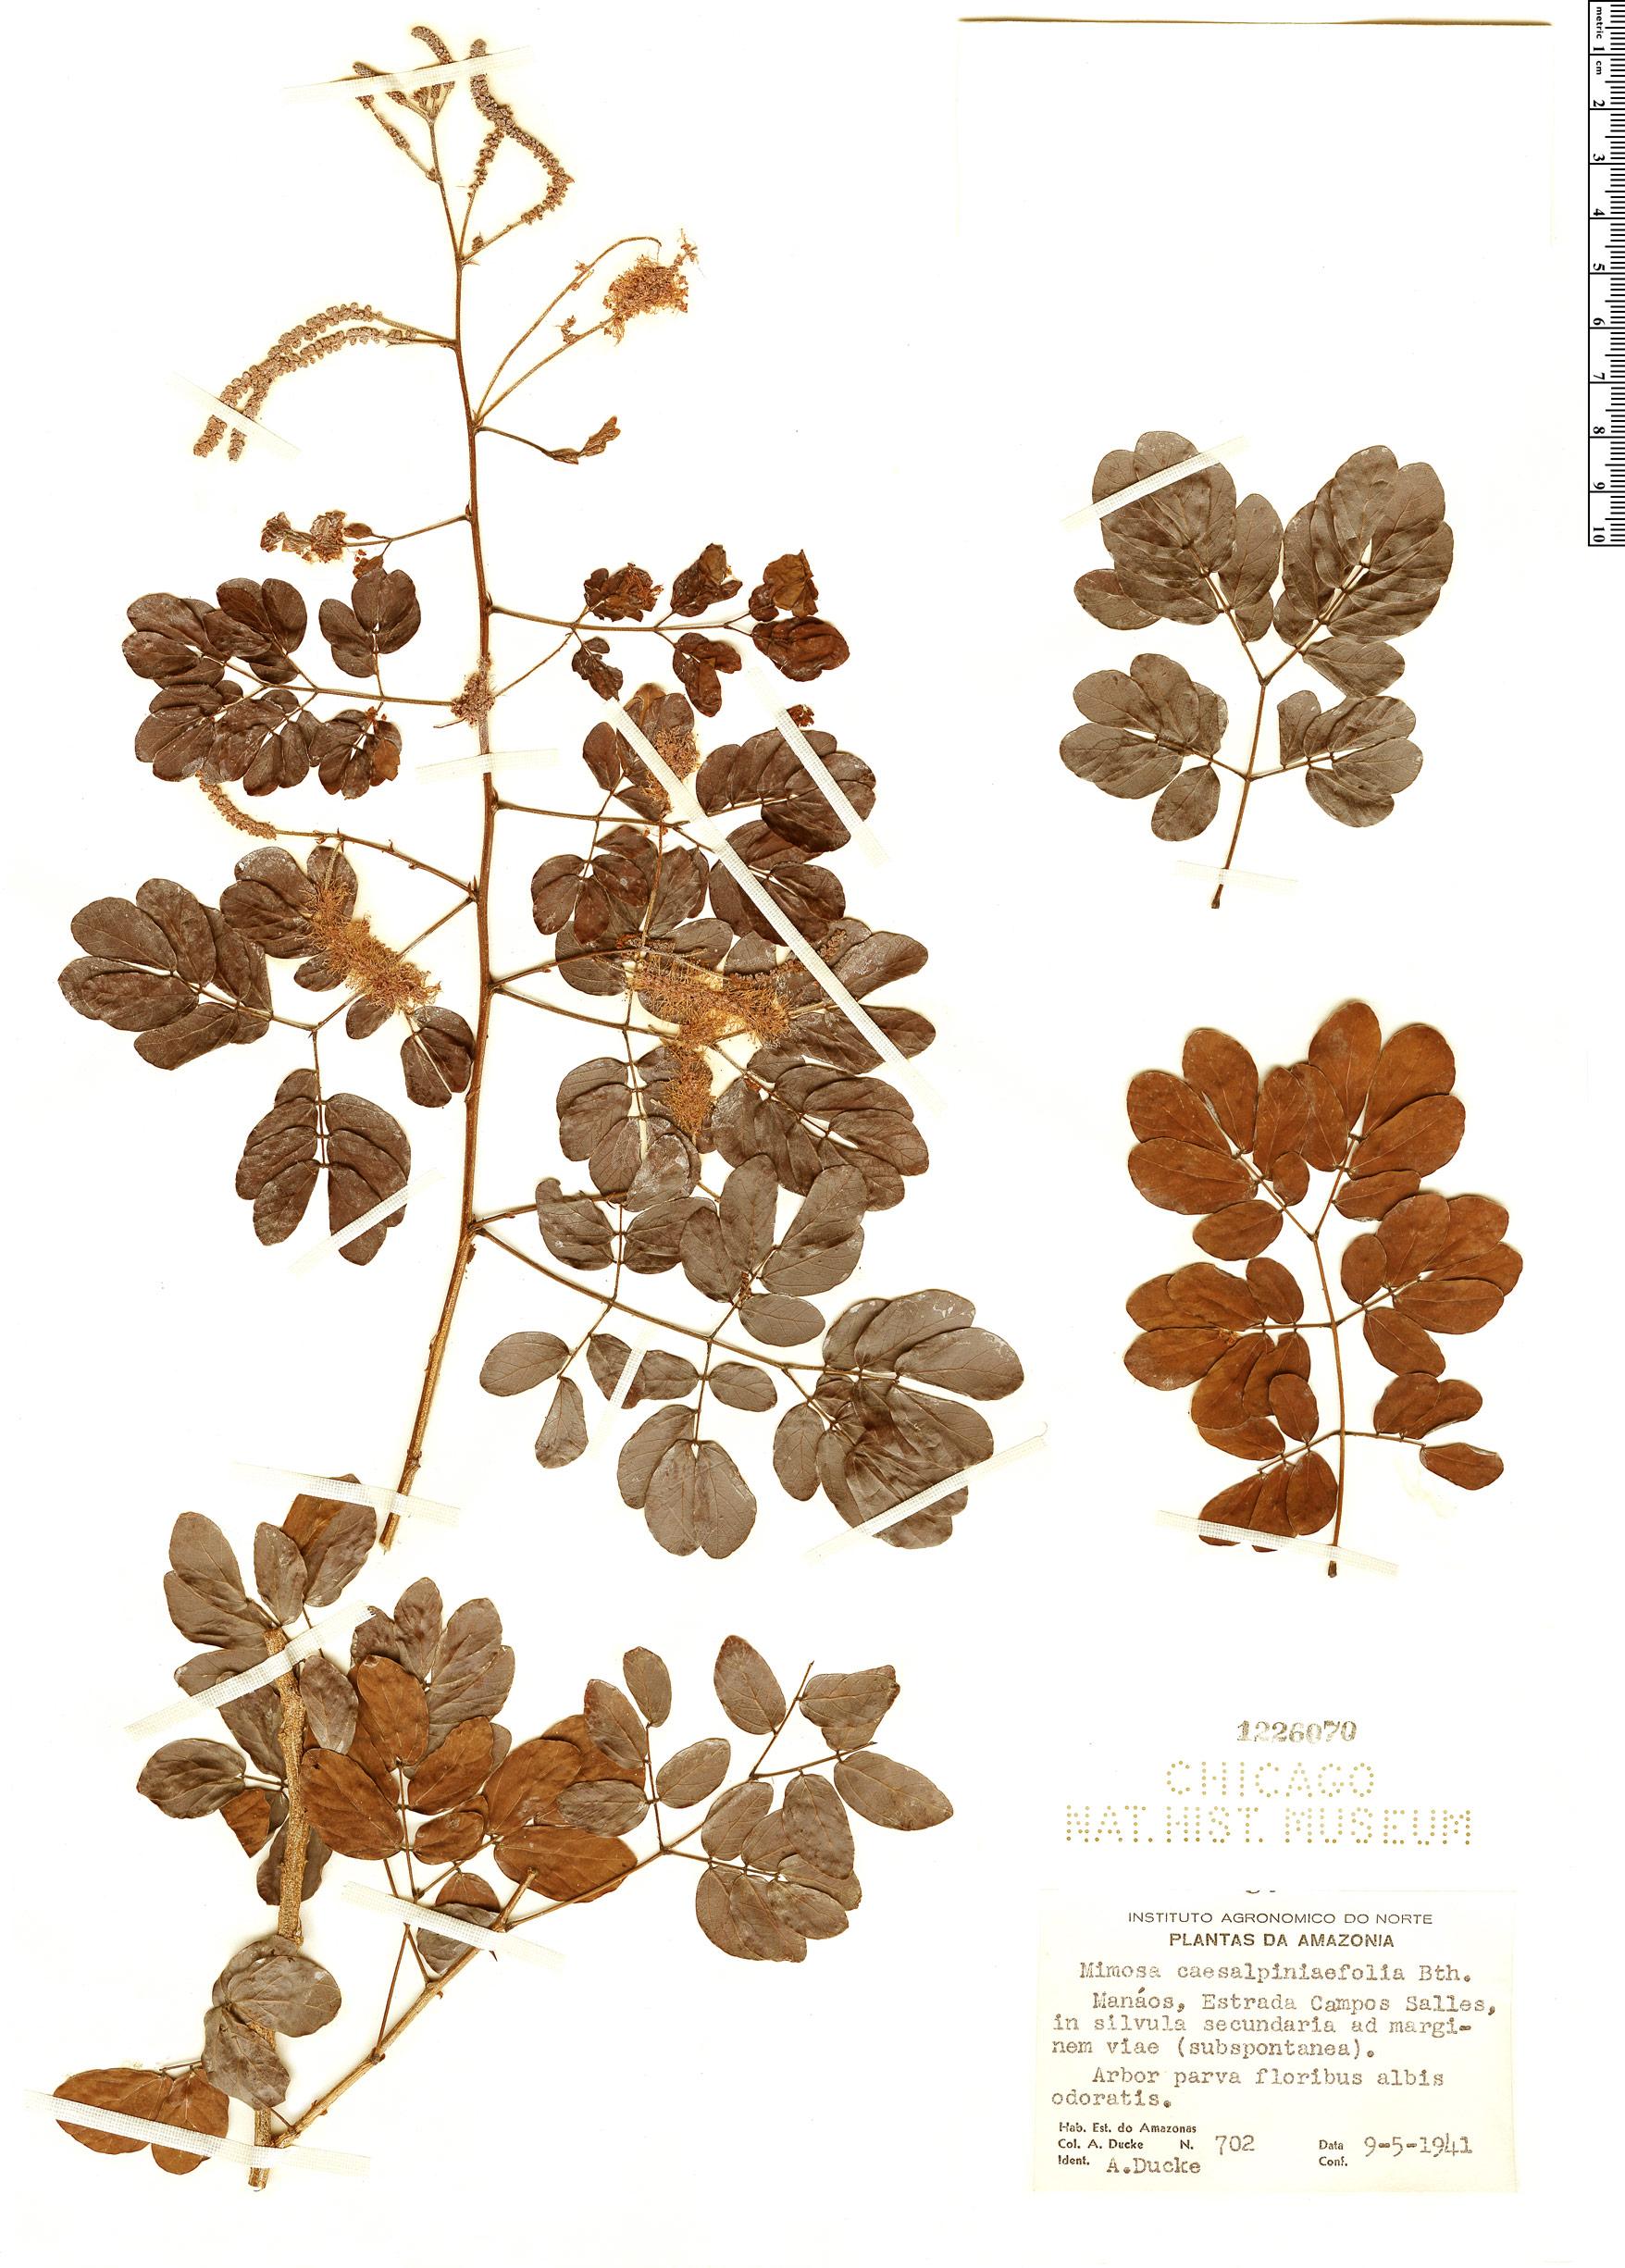 Espécime: Mimosa caesalpiniifolia